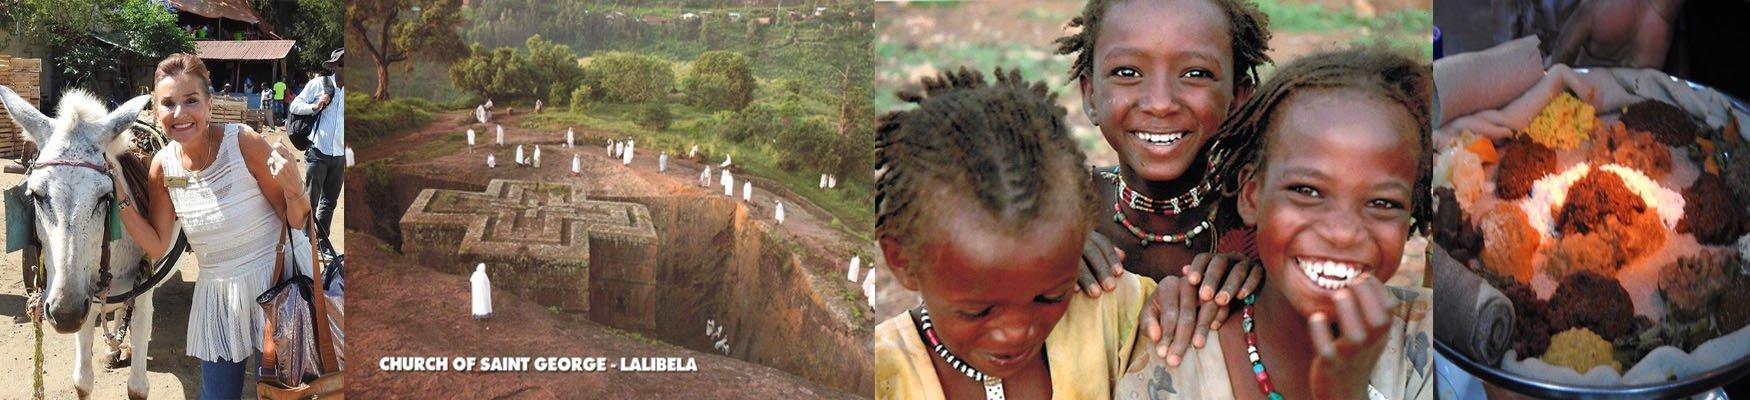 Malawi and Ethiopia